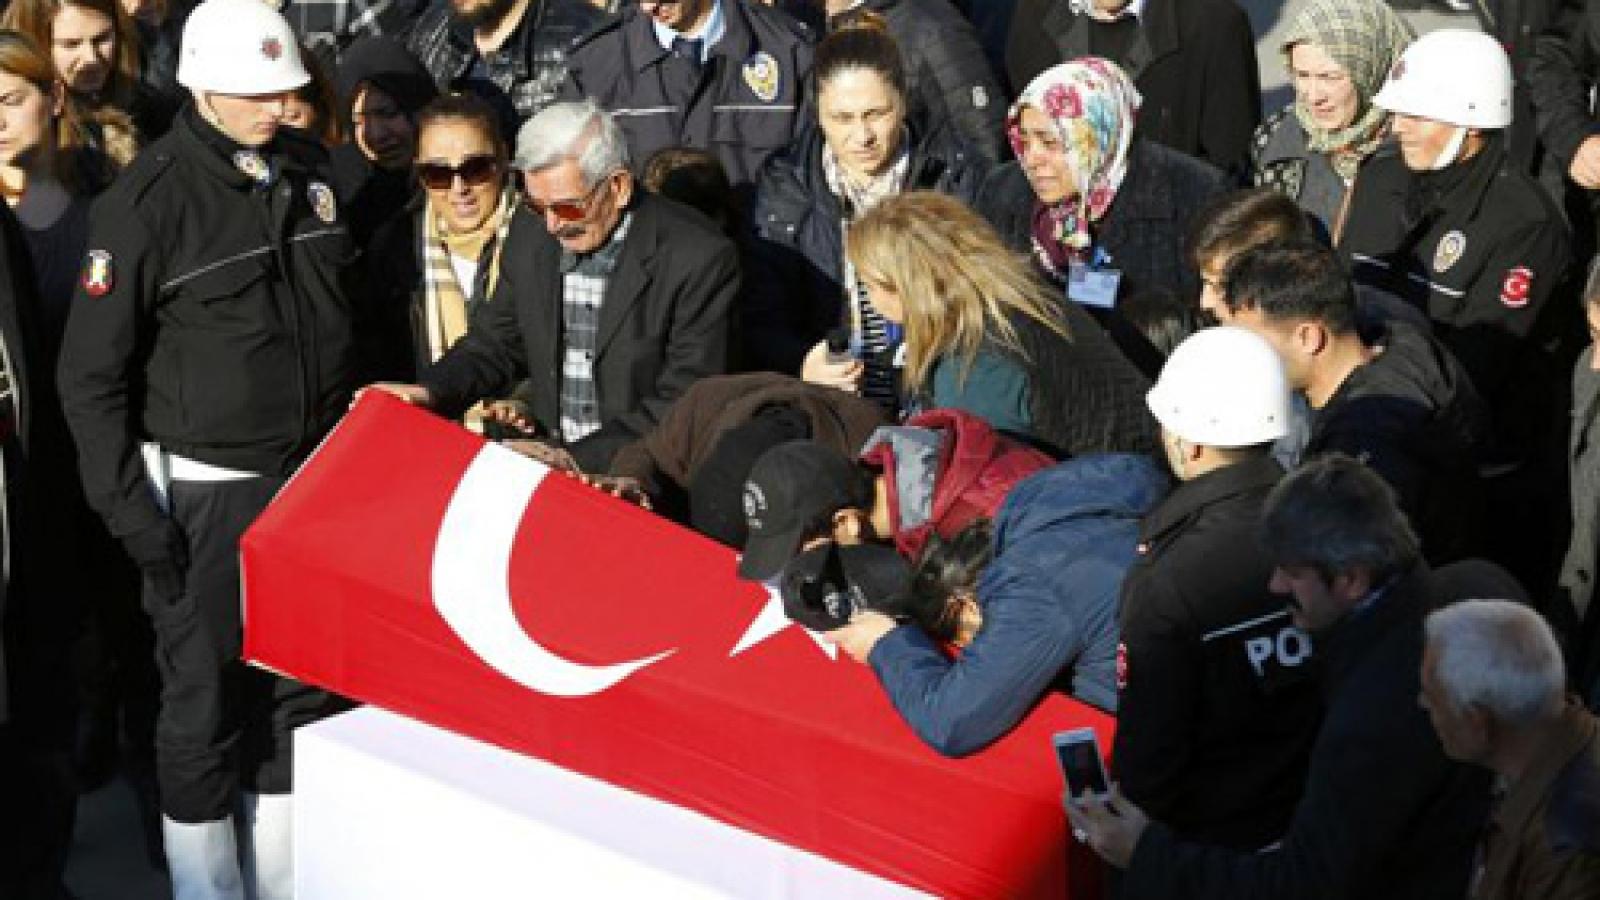 Kurdish militants claim responsibility for Istanbul attack that killed 38